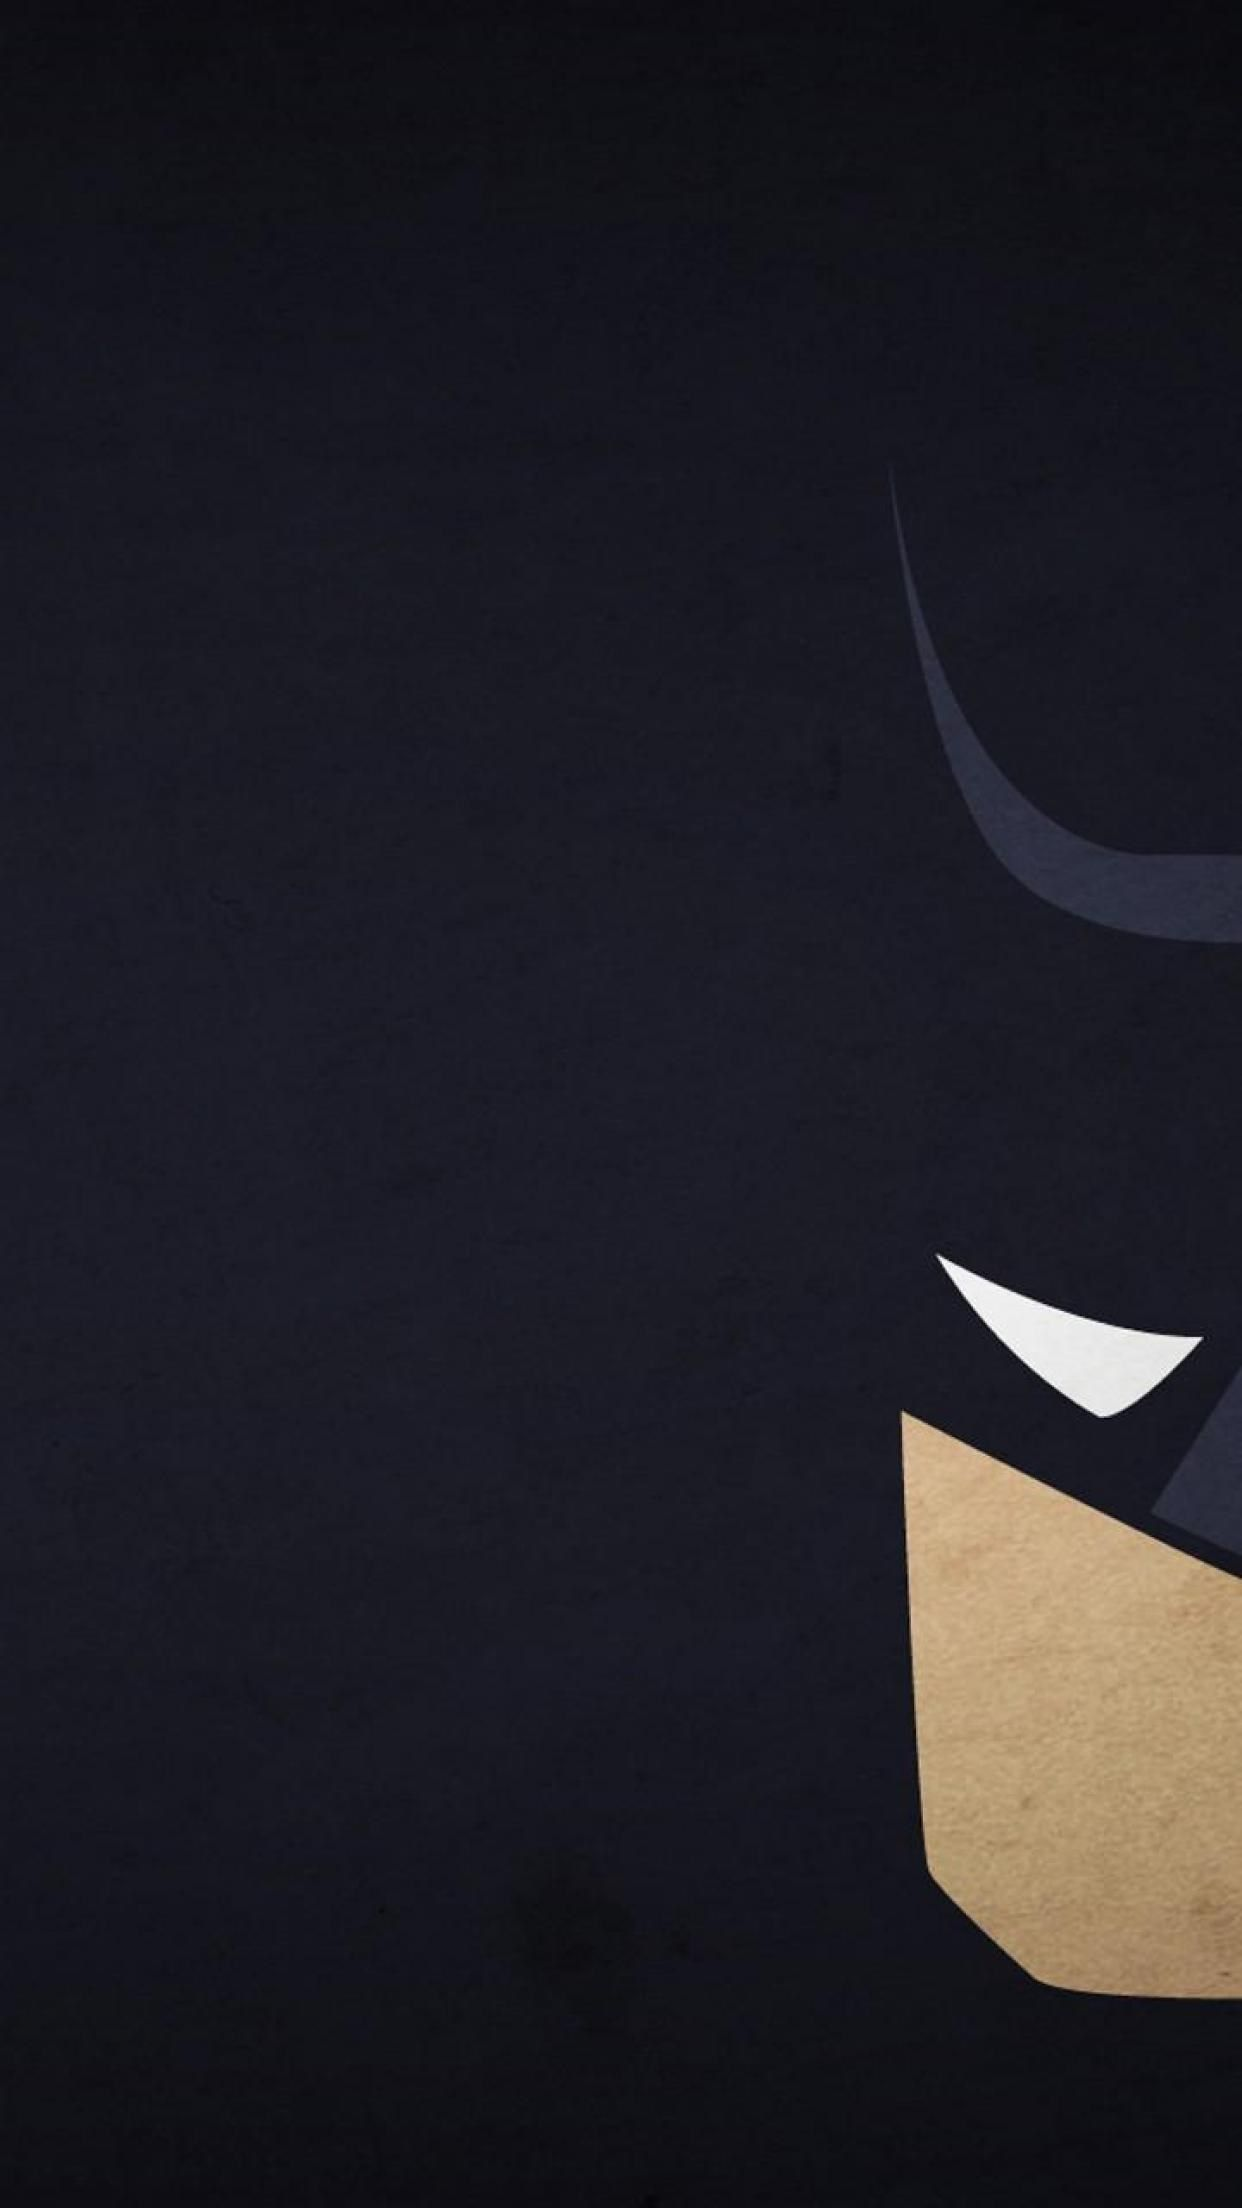 Art Images Batman Iphone Wallpaper High Quality Superman Logo